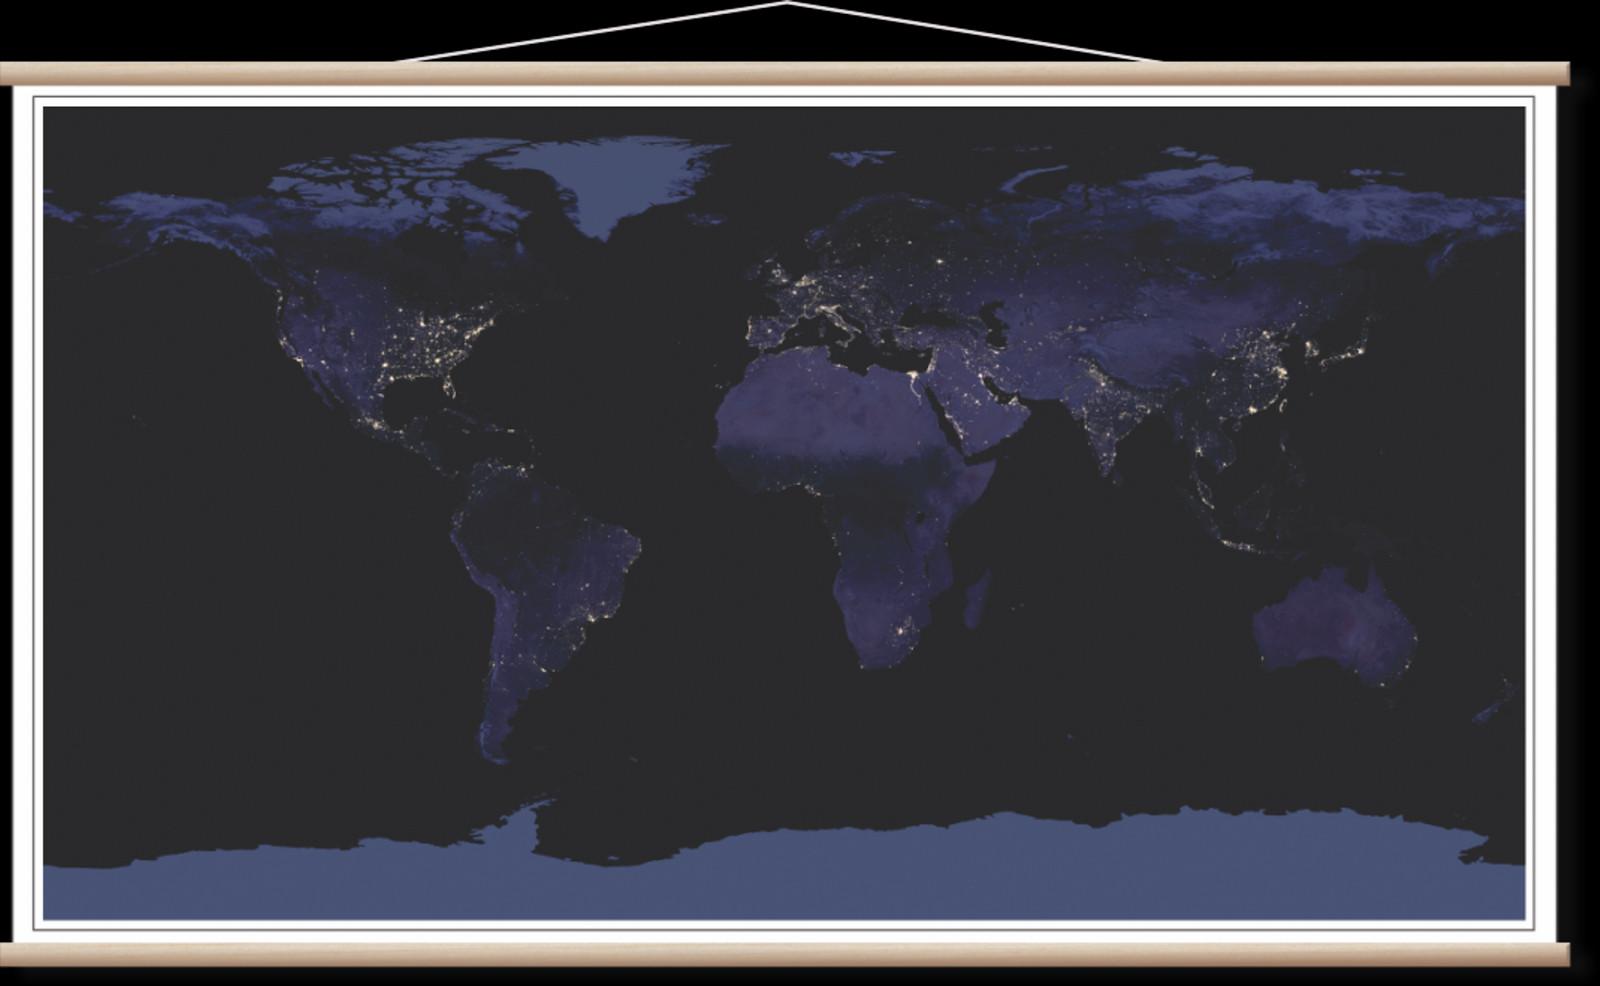 Nocna Satelitska Karta Sveta